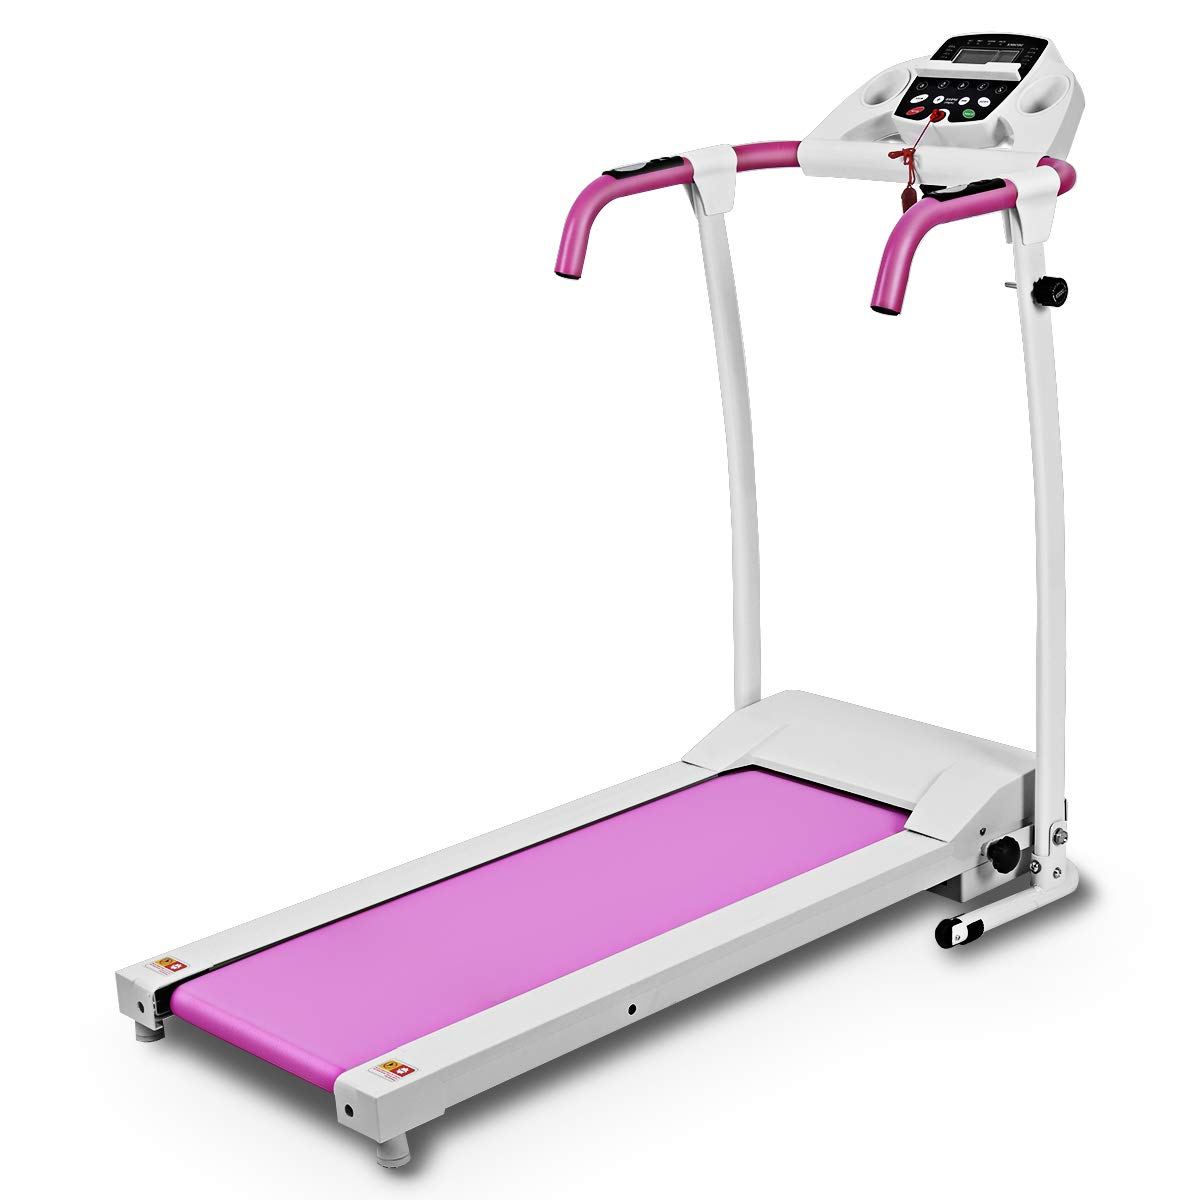 GOPLUS Folding Treadmill Electric Motorized